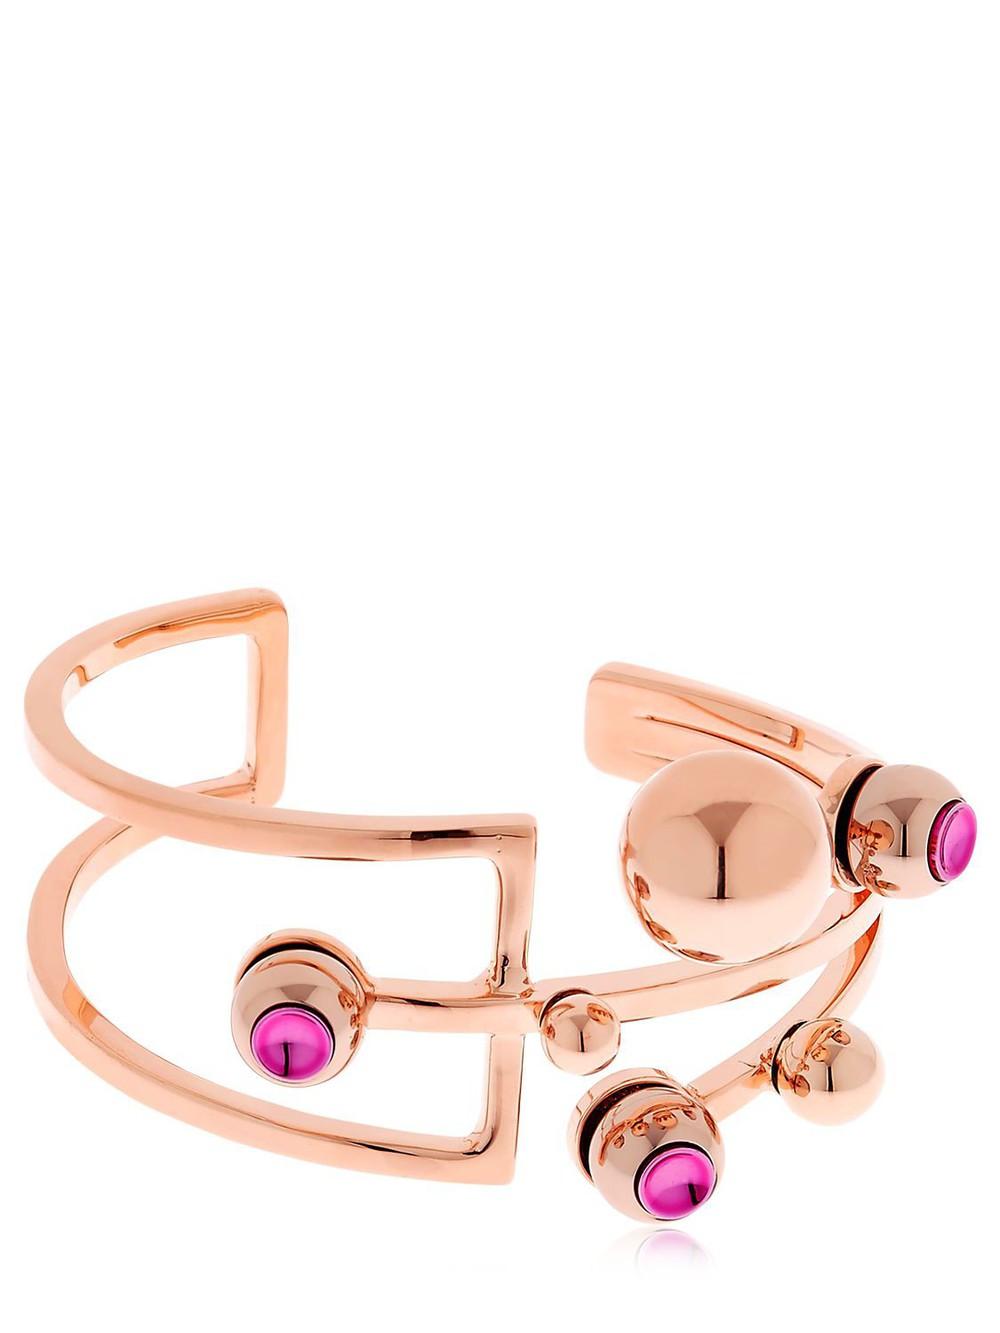 GIULIANA MANCINELLI Mocker Bracelet in gold / rose